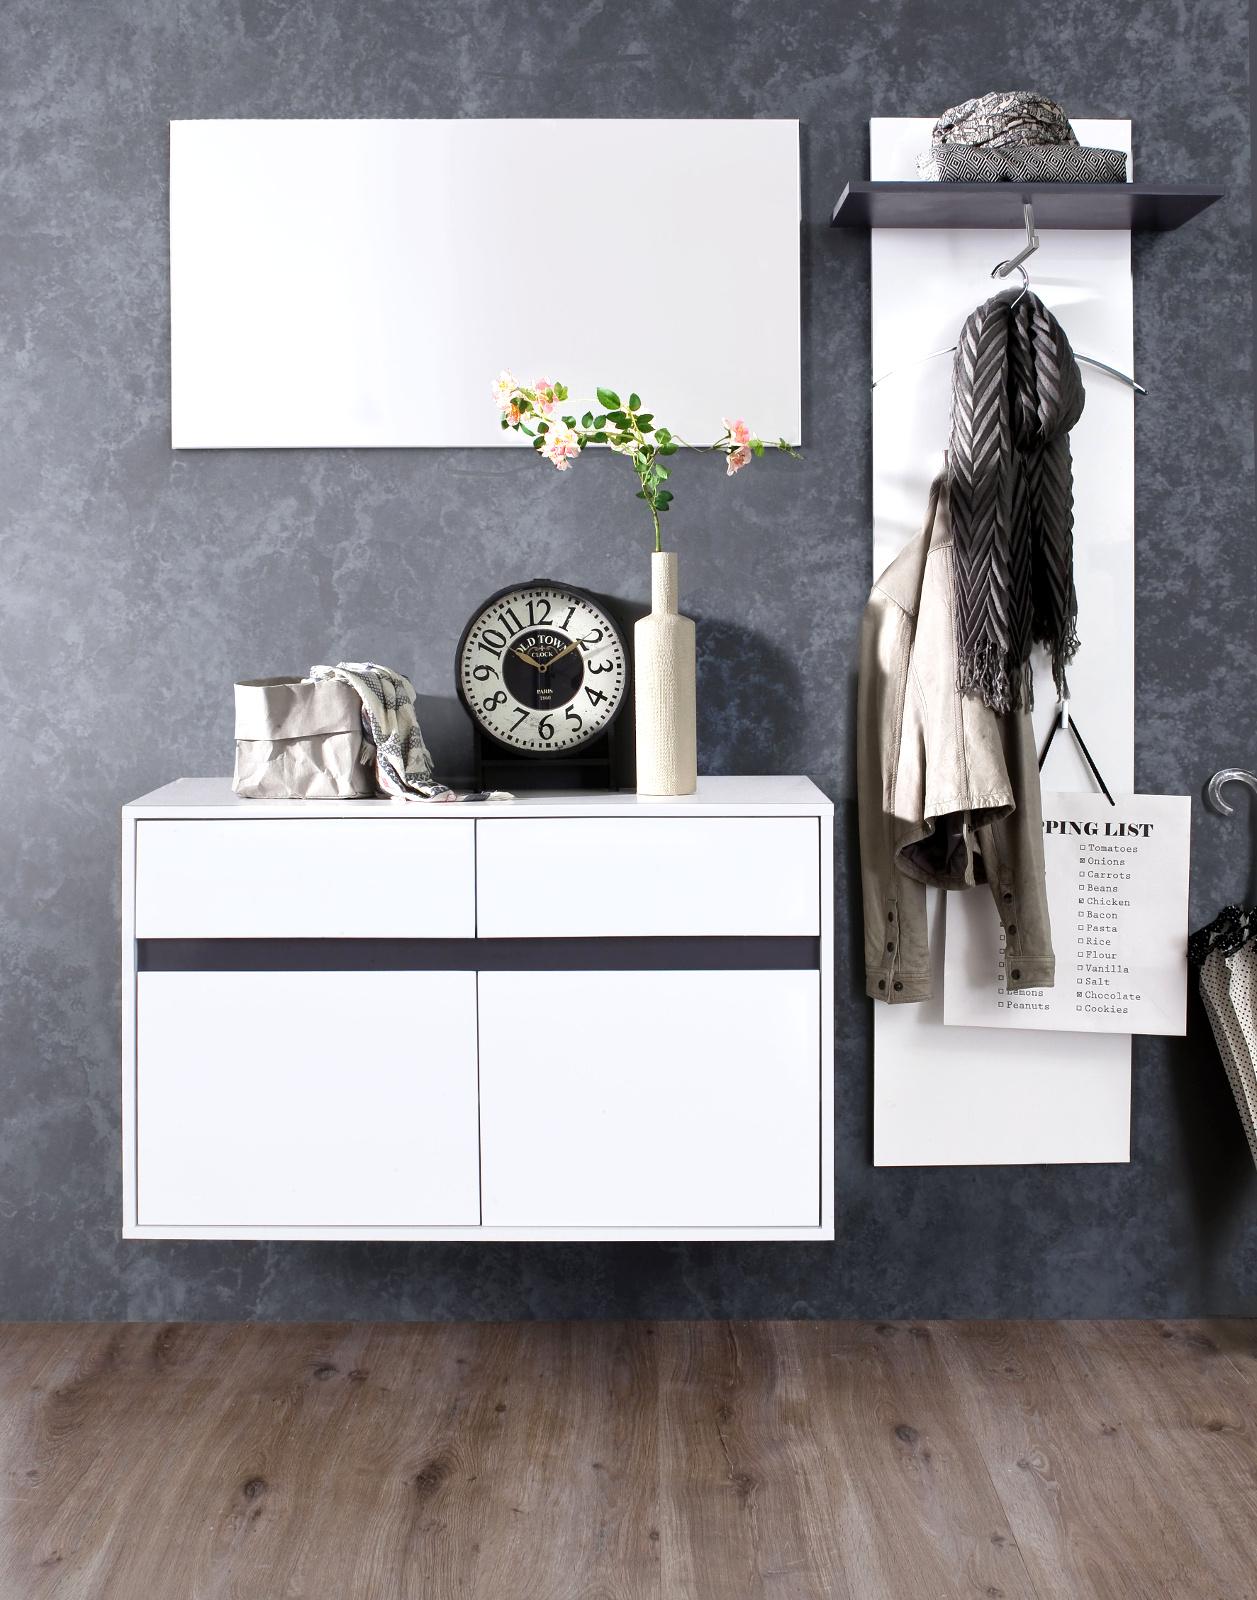 flurgarderobe sol lack hochglanz wei und grau 3 teilig. Black Bedroom Furniture Sets. Home Design Ideas